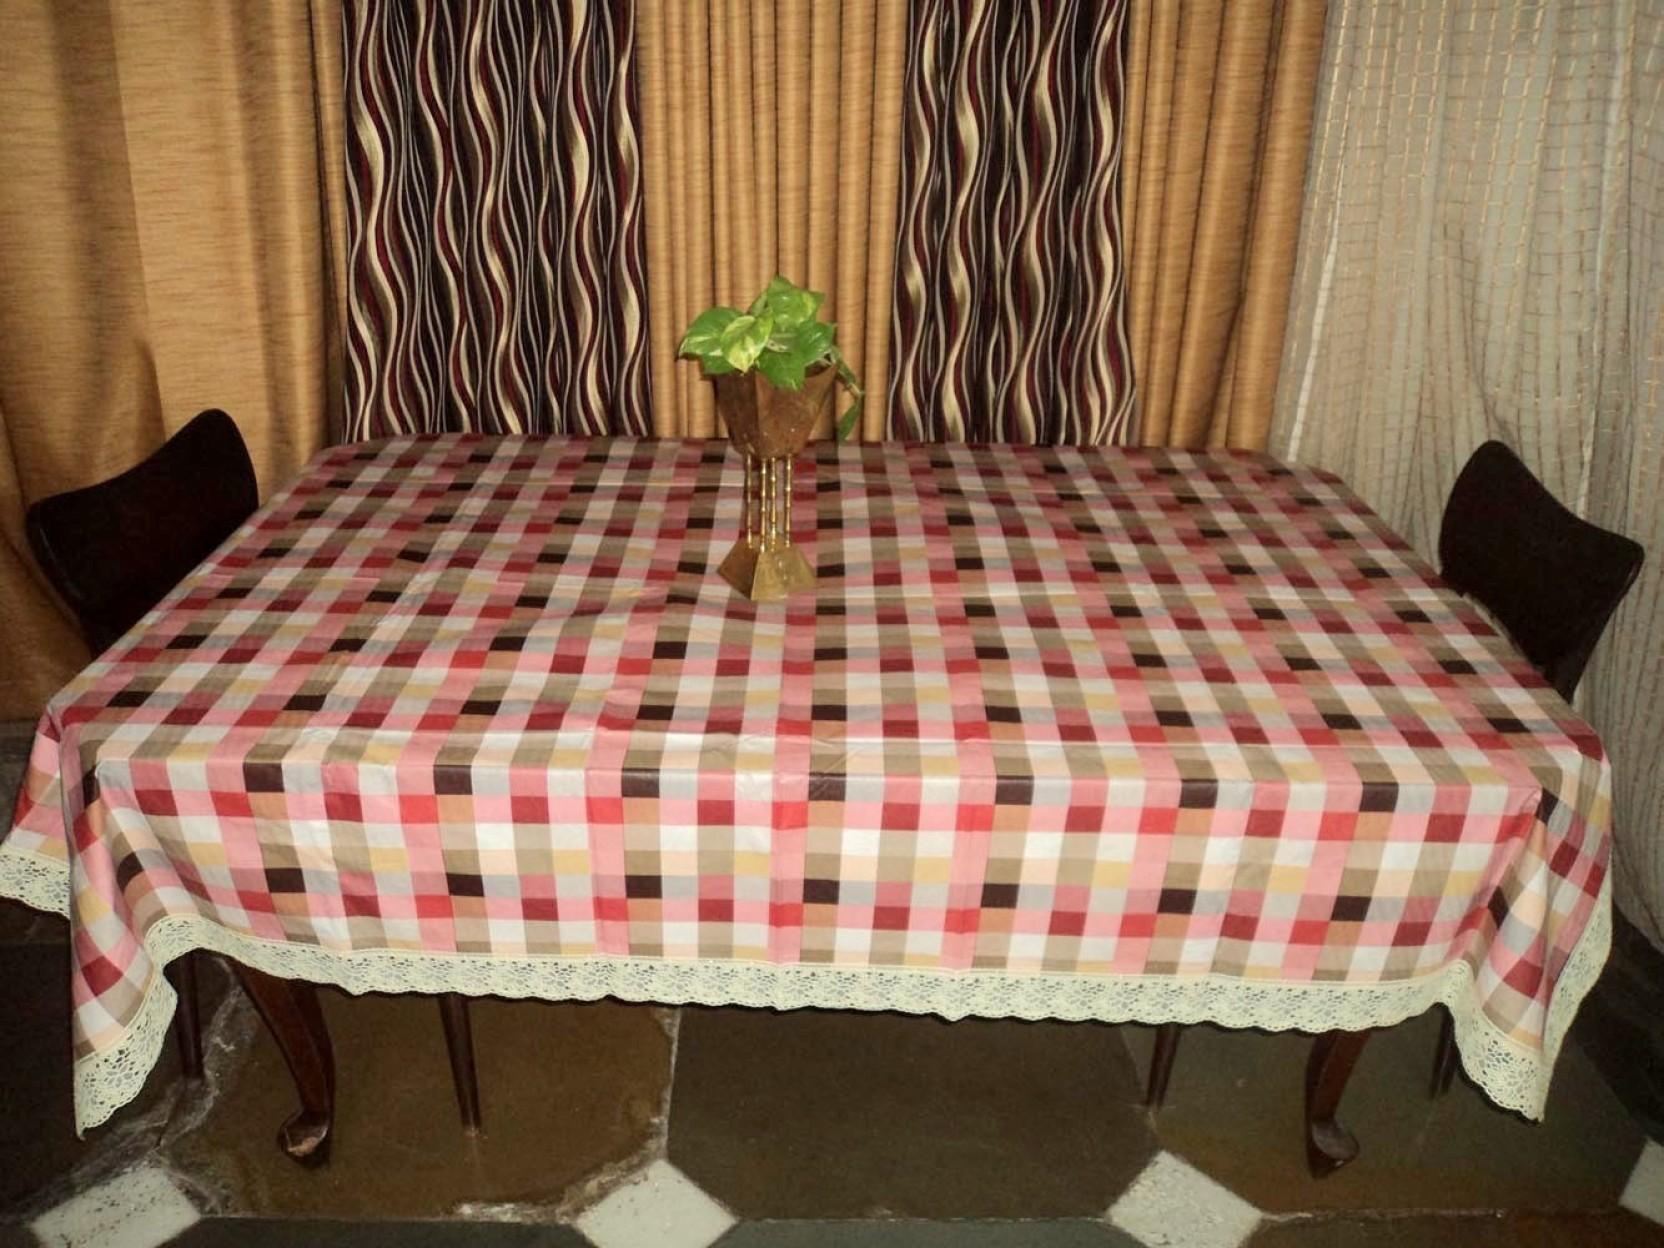 Amita Home Furnishing Checkered 6 Seater Table Cover Buy  : ahfta29 1 amita home furnishing baithak ki shaan original imae9kjgwrhhtkgm from www.flipkart.com size 1664 x 1248 jpeg 420kB